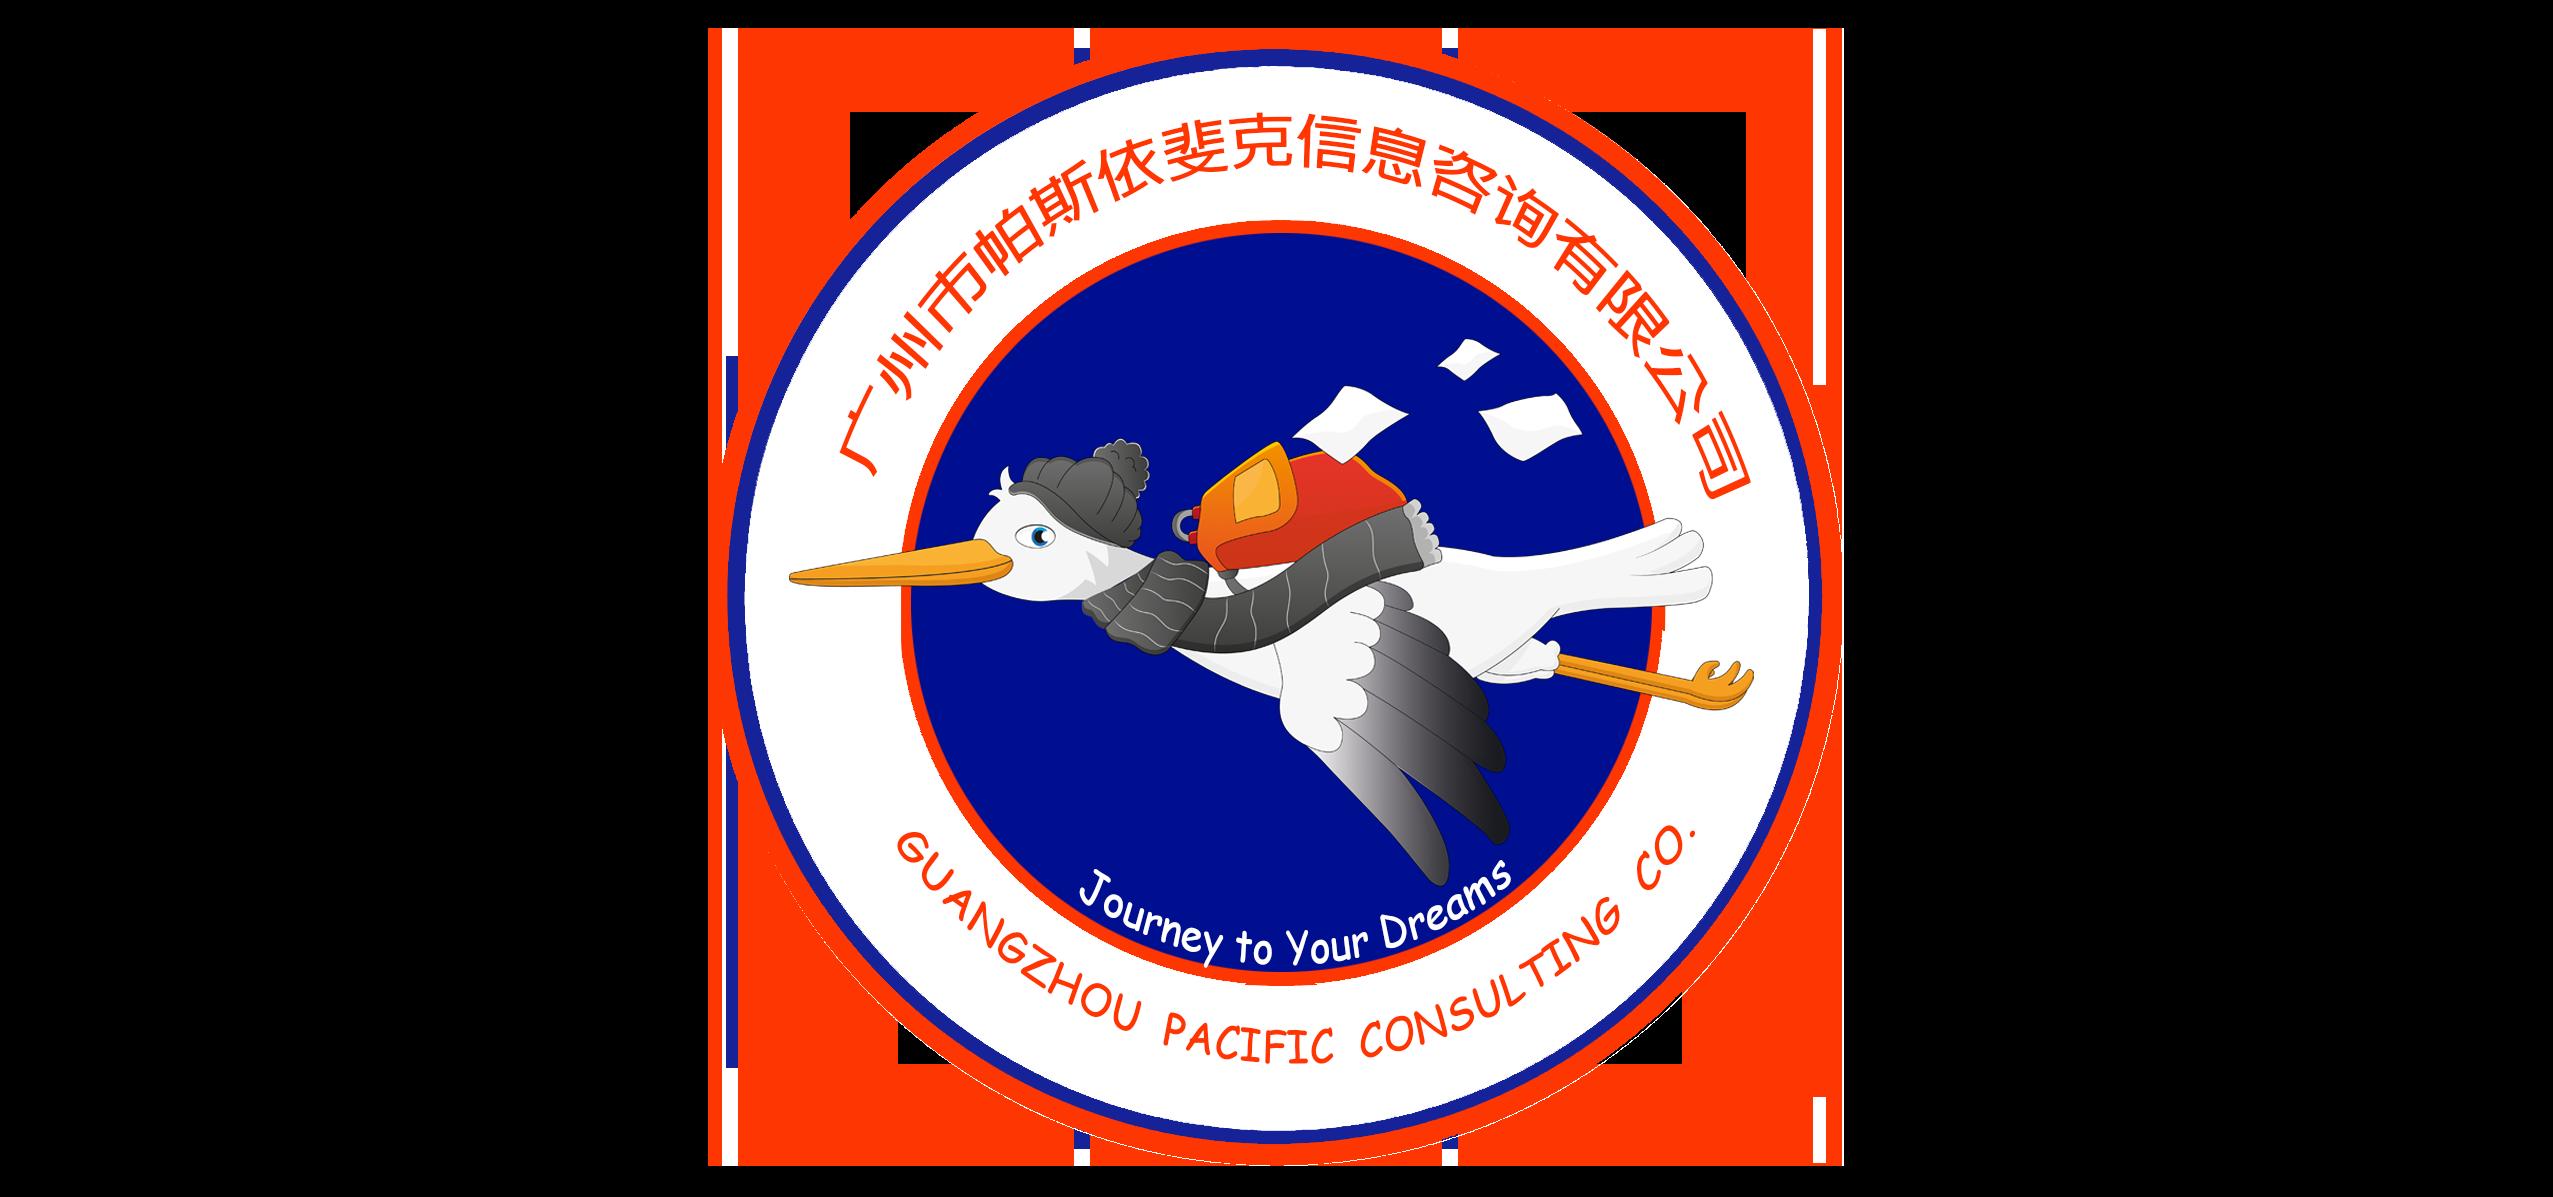 GUANGZHOU PACIFIC CONSULTING CO. LTD.